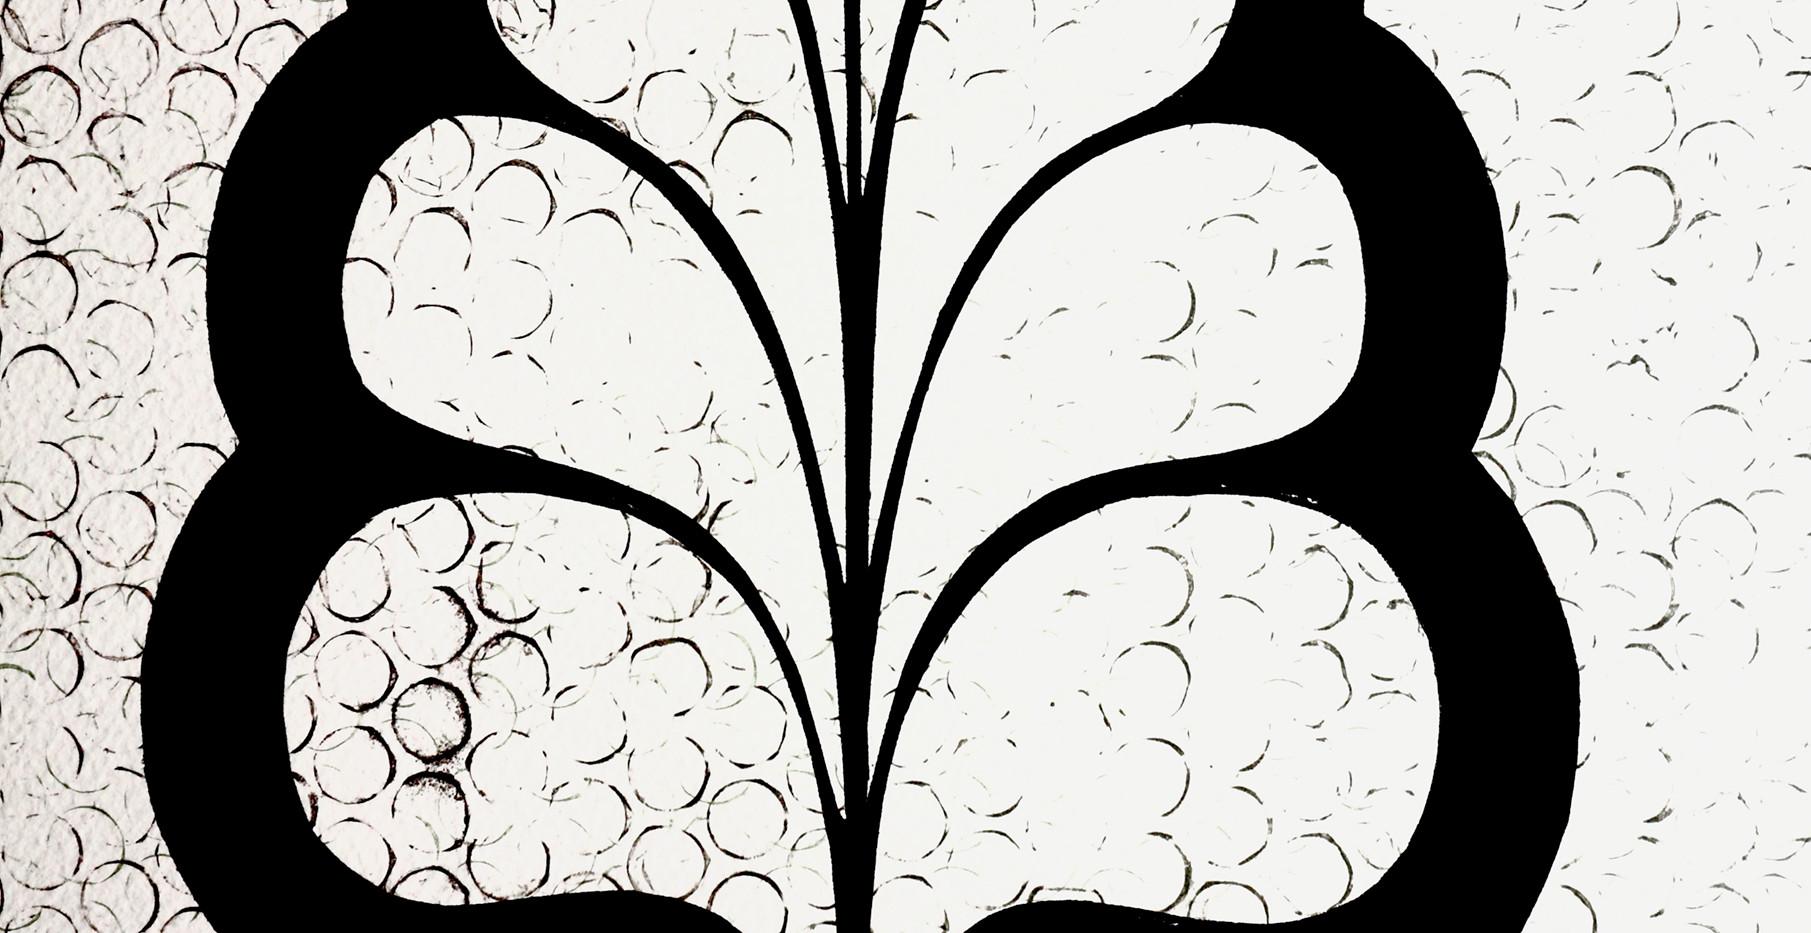 Seeds 4 (detail)